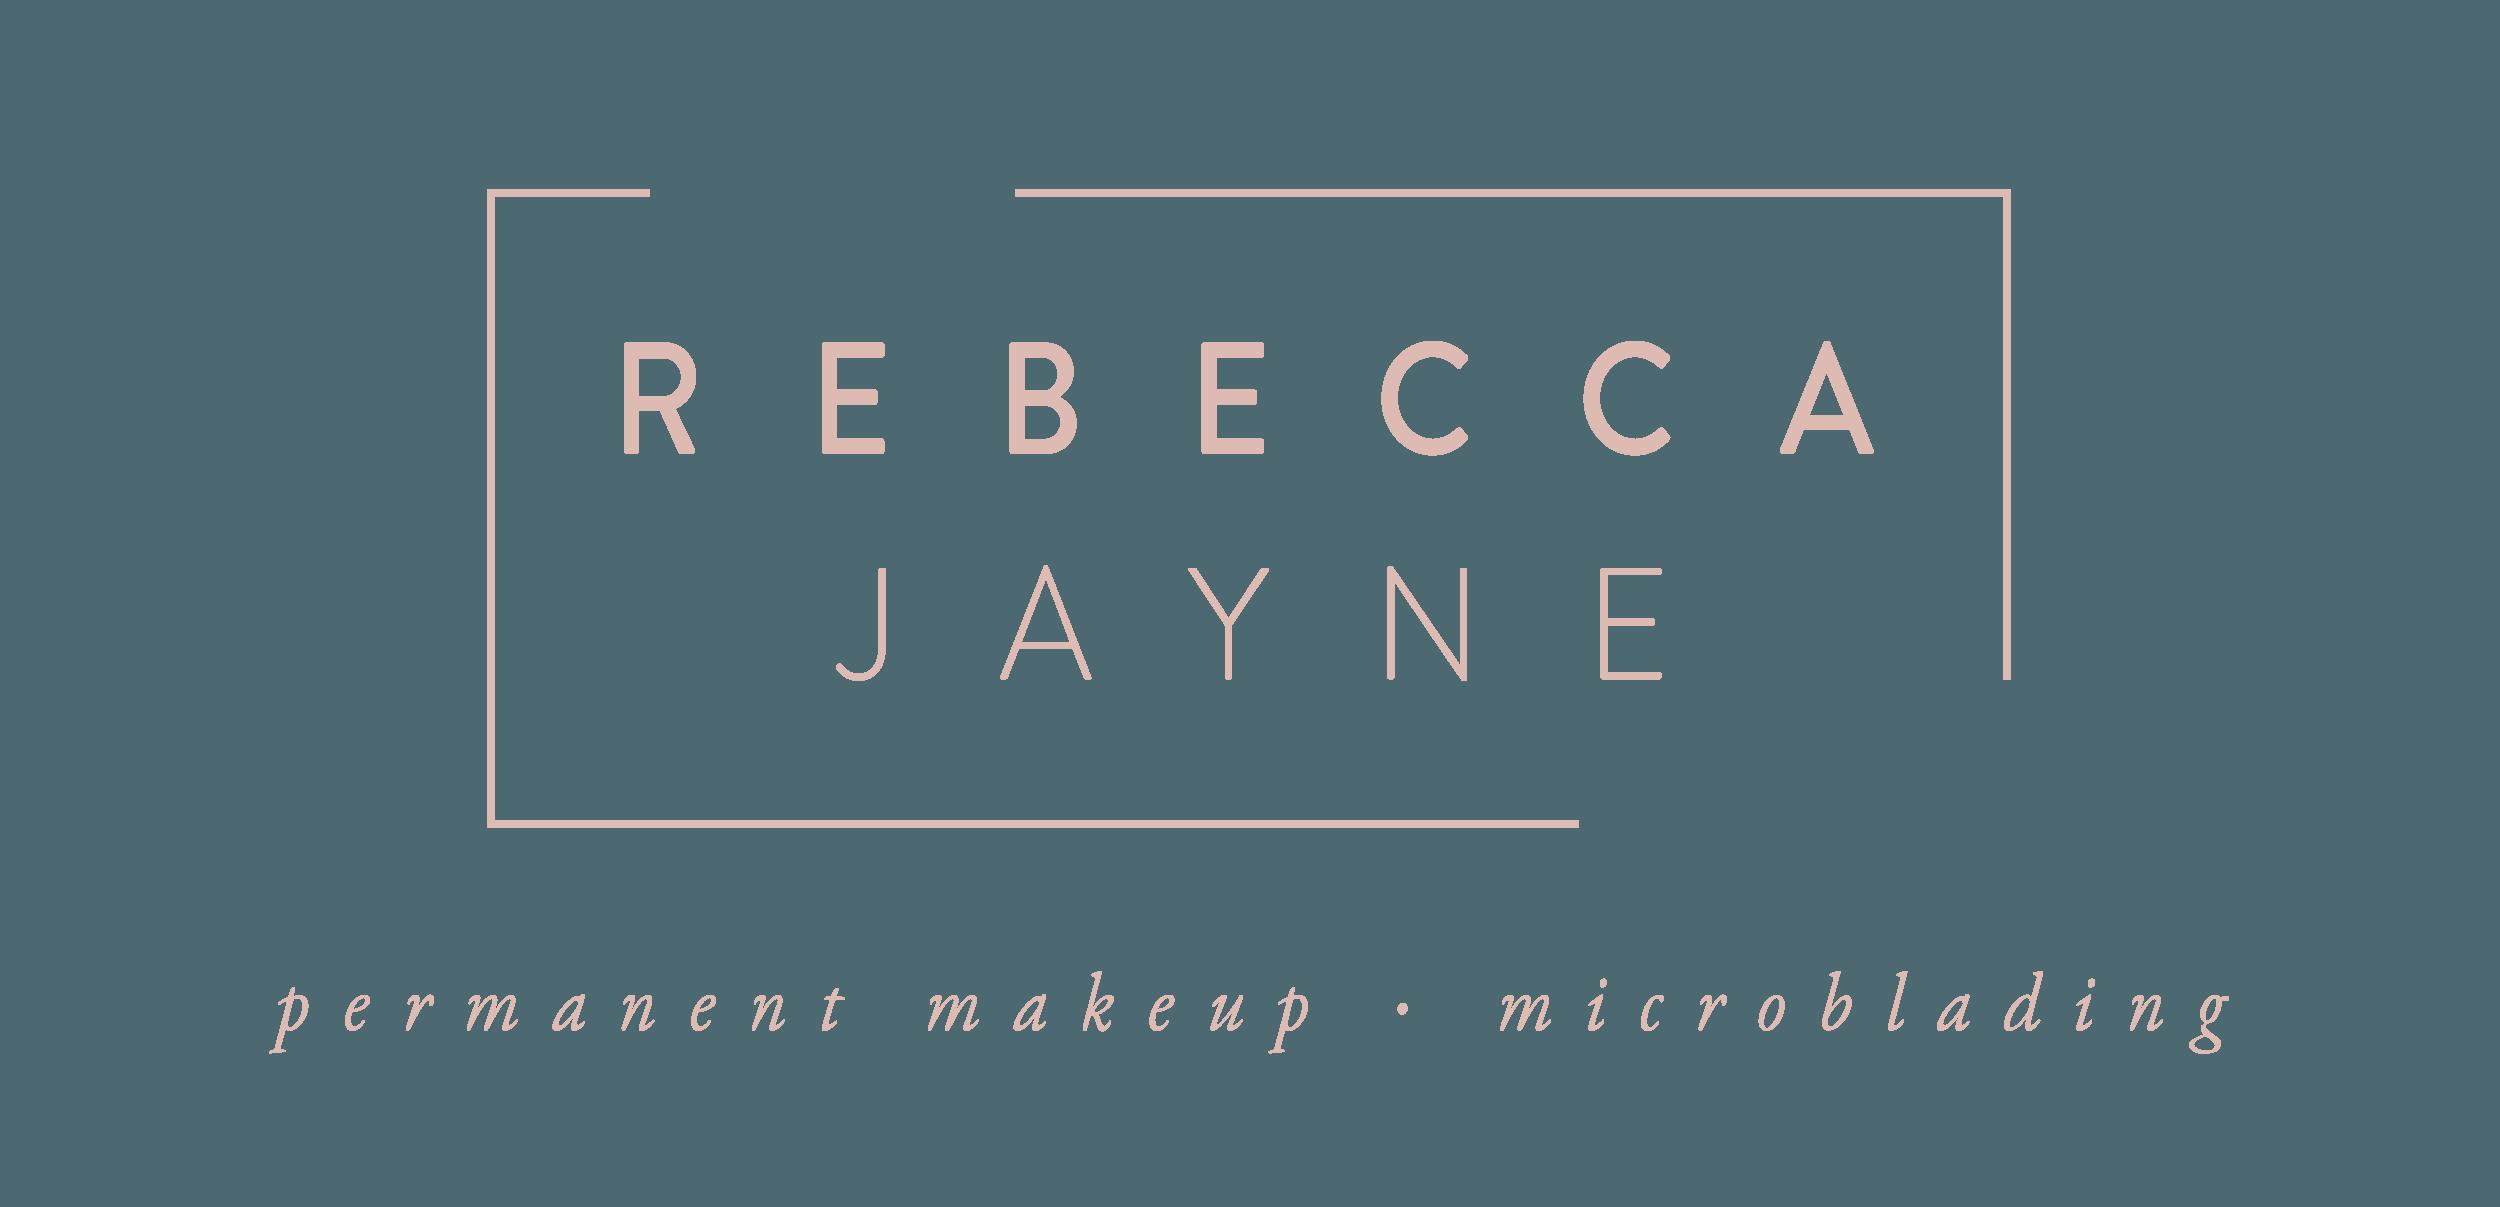 Rebecca Jayne Permanent Makeup - Microblading